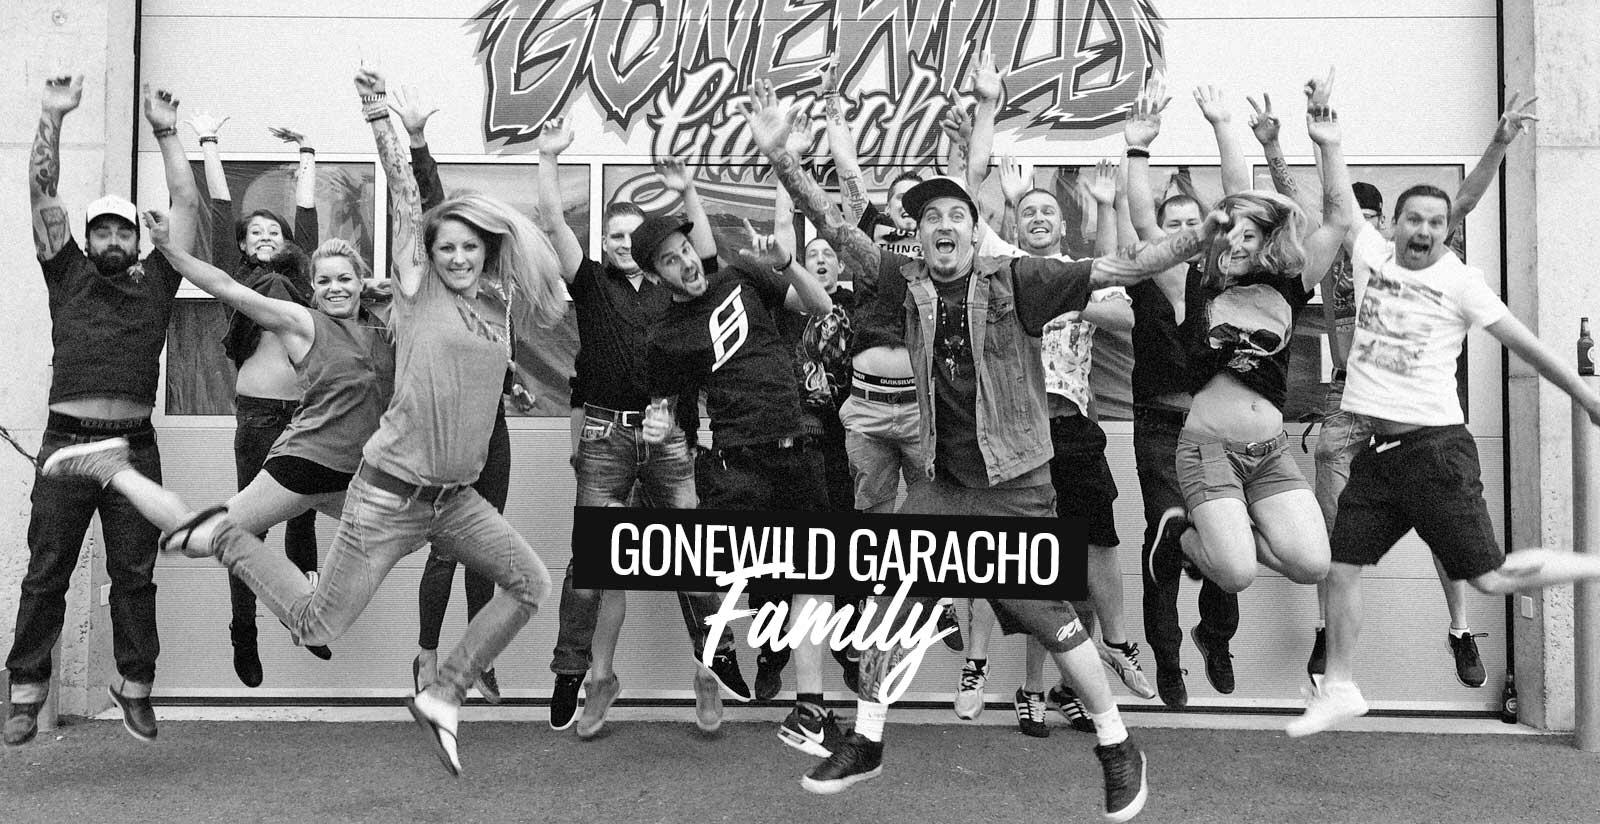 Gonewild Garacho Family